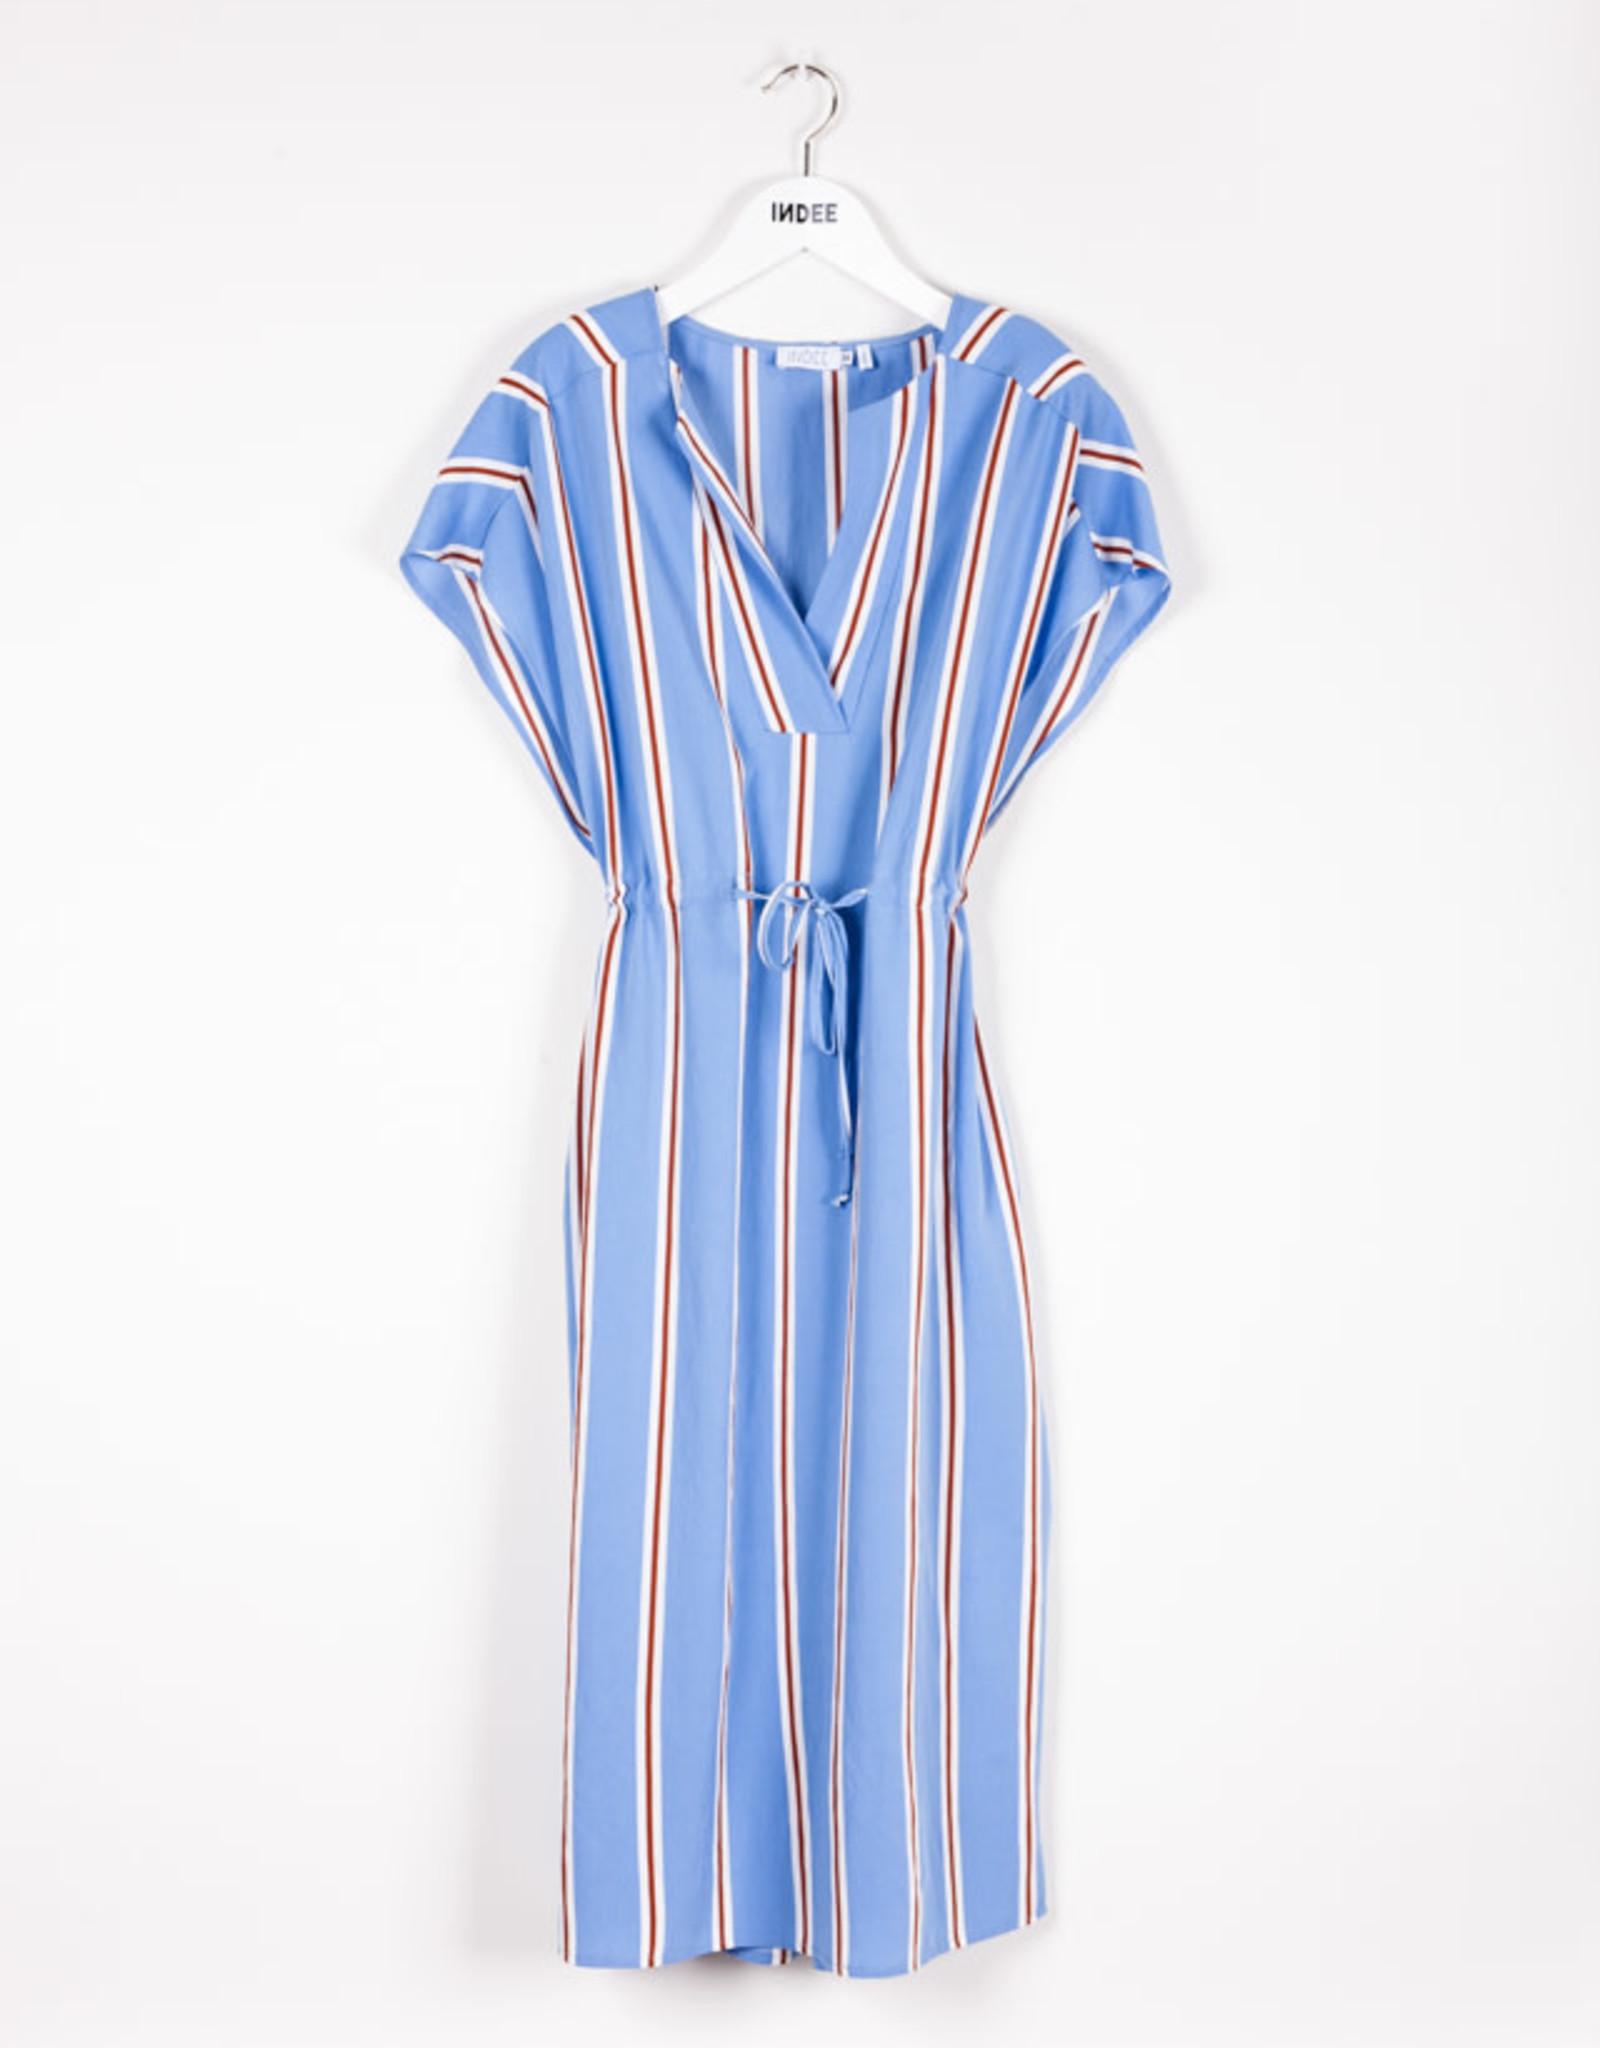 INDEE INDEE Dress Jarnac Skyblue